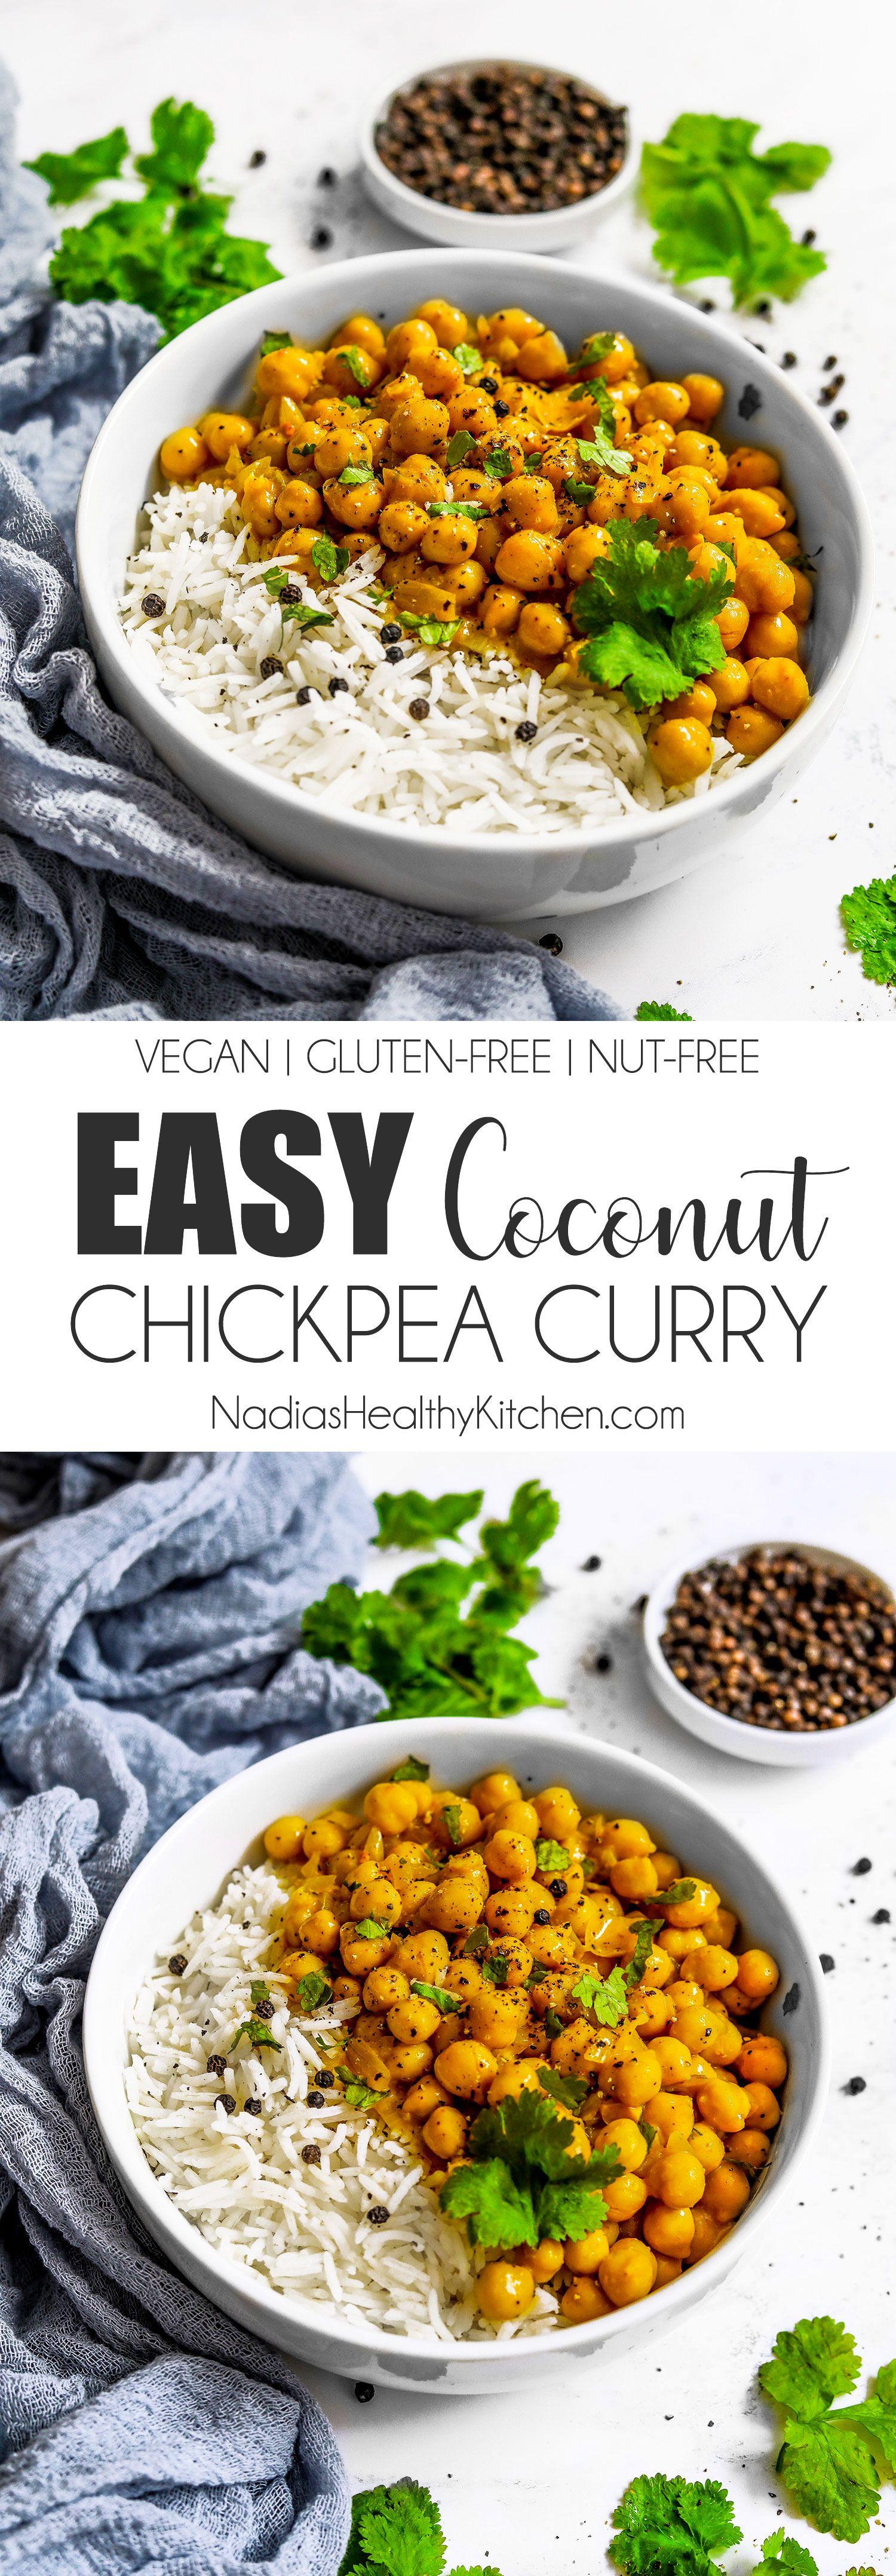 Photo of Easy Coconut Chickpea Curry – Gesundheitsblog in Großbritannien – Nadias gesunde Küche